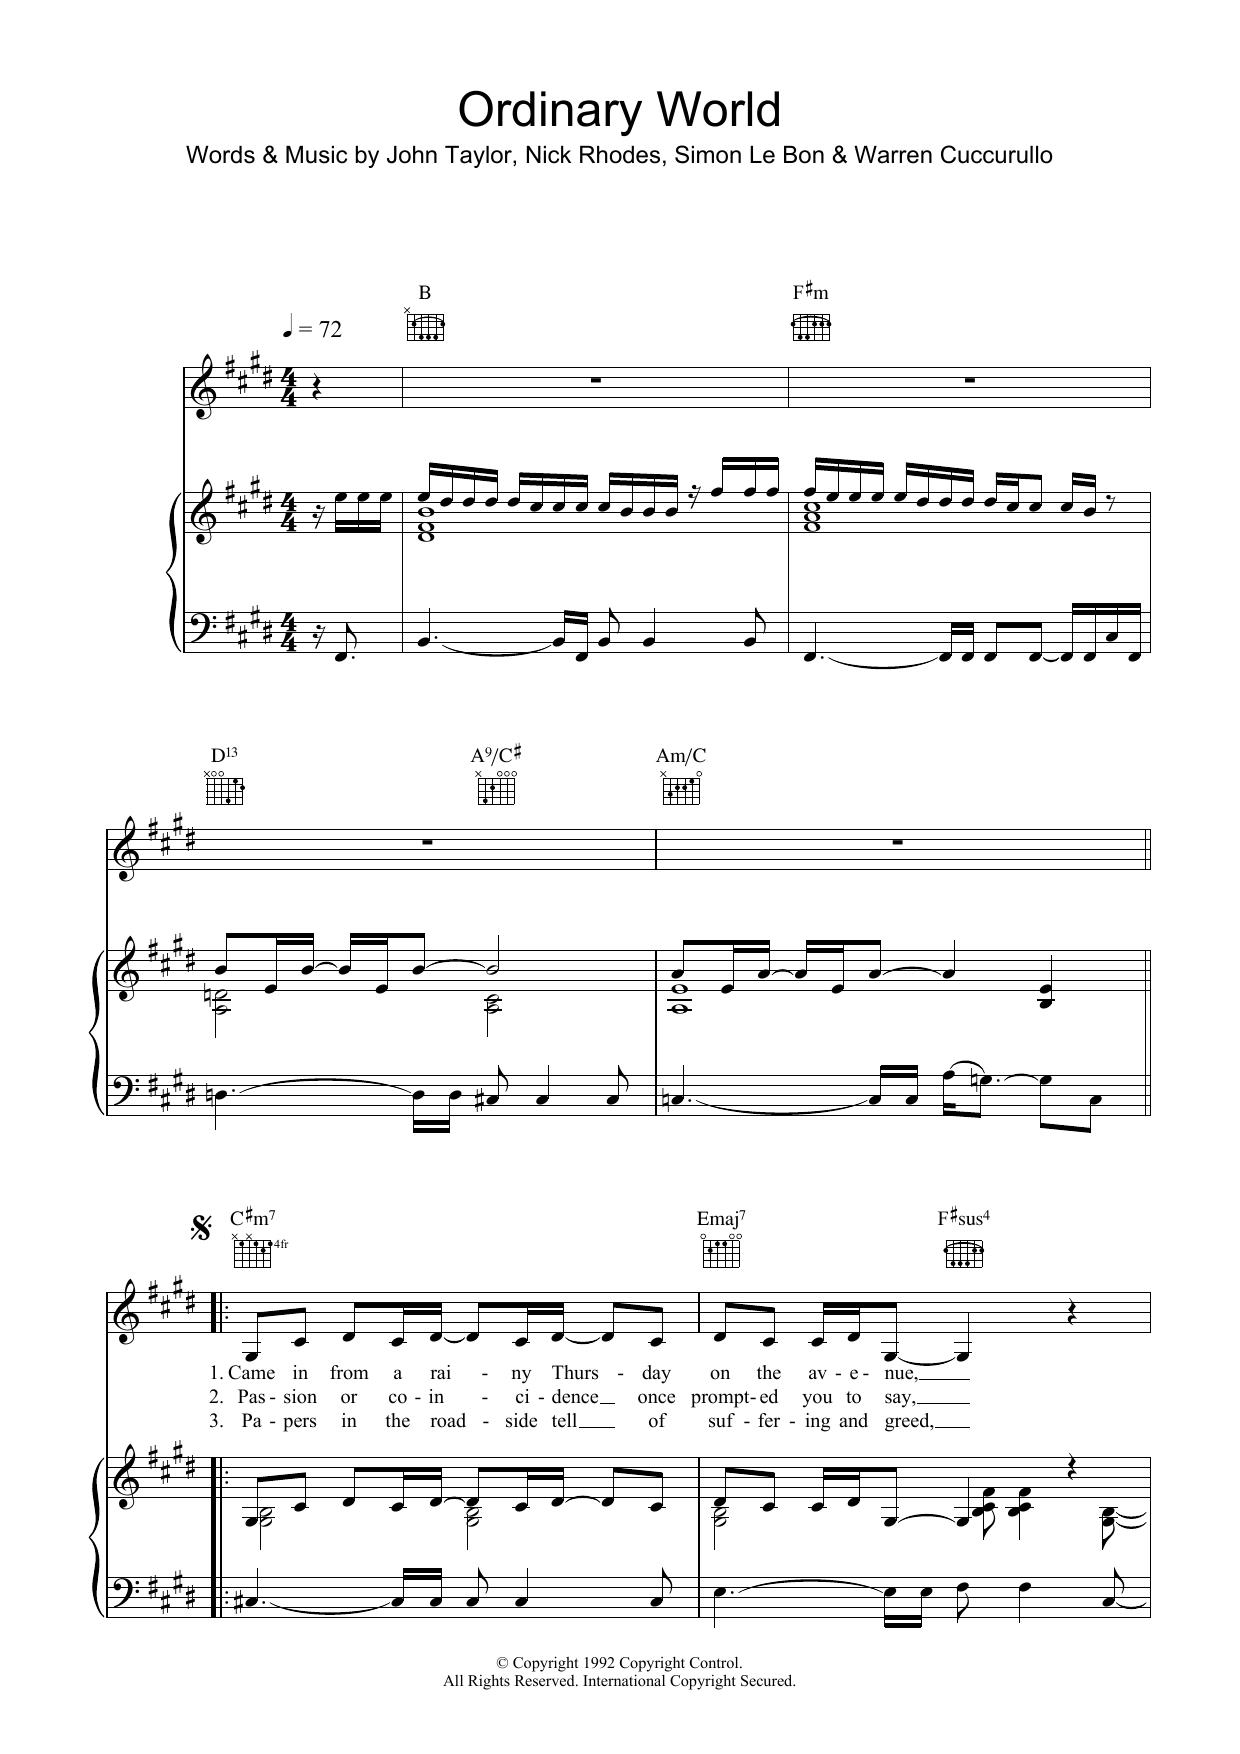 Ordinary World Sheet Music   Duran Duran   Piano, Vocal & Guitar ...